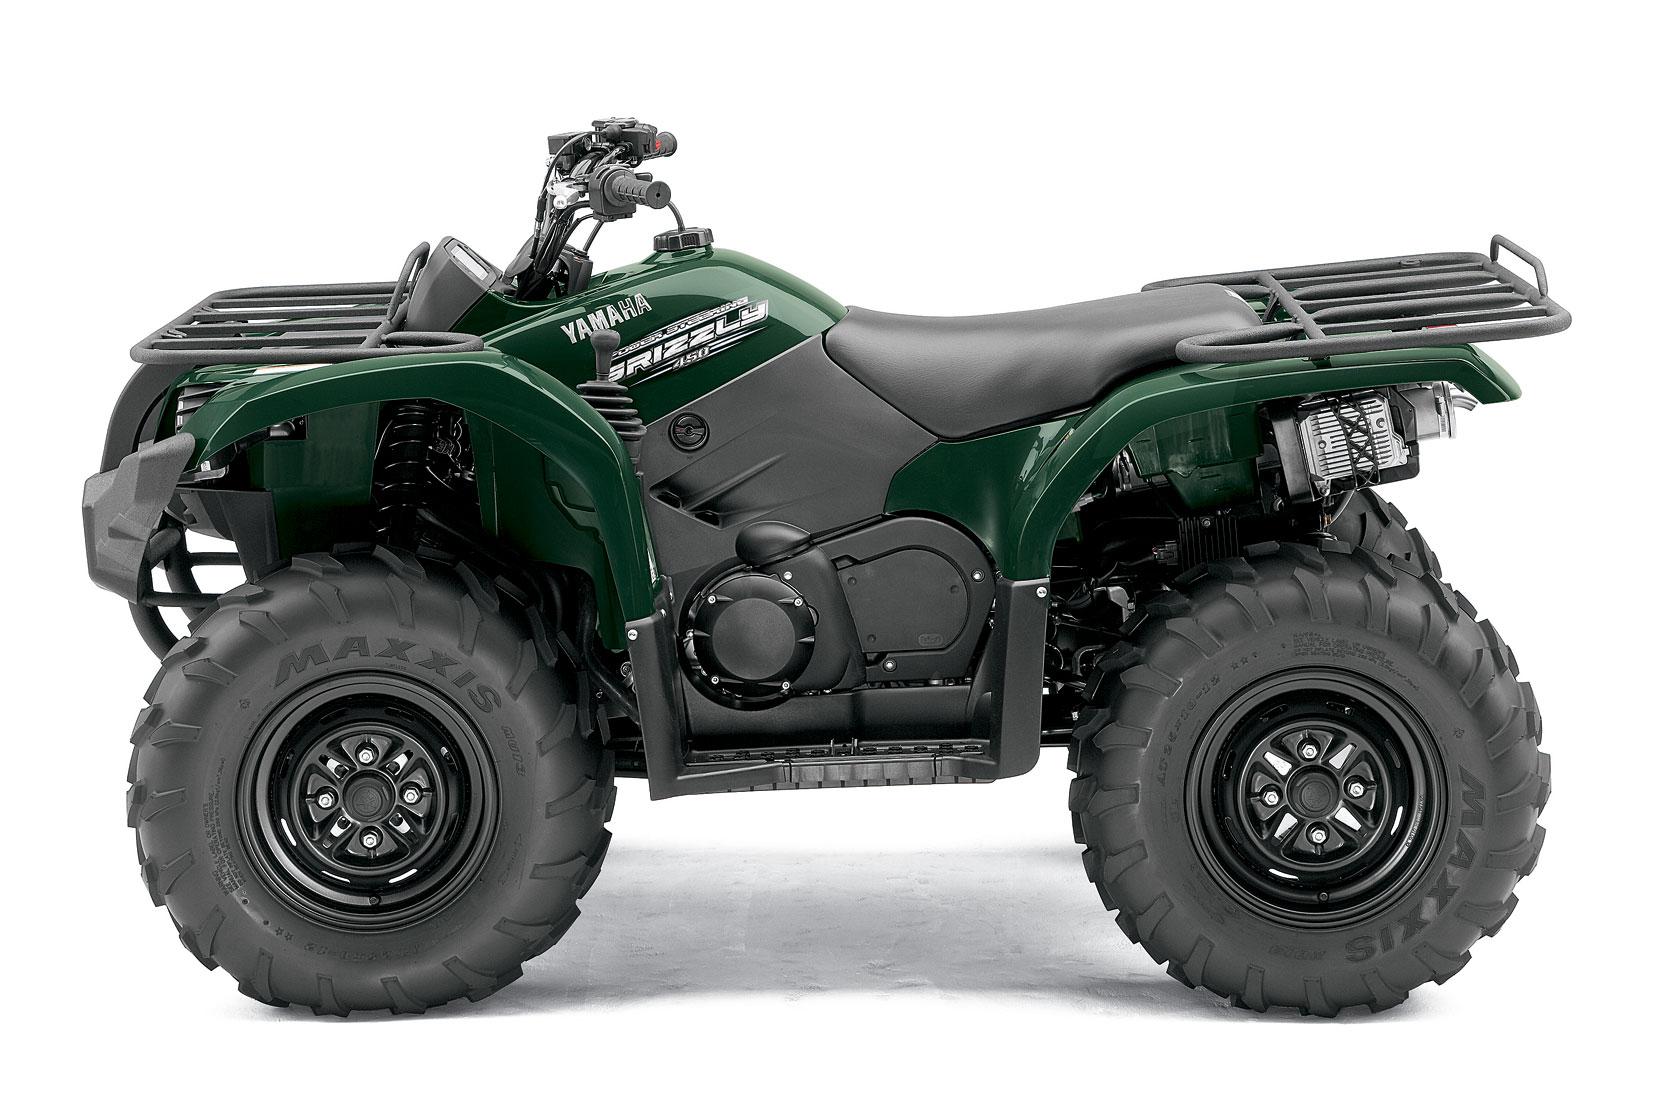 YAMAHA Grizzly 450 4x4 EPS specs - 2010, 2011 - autoevolution